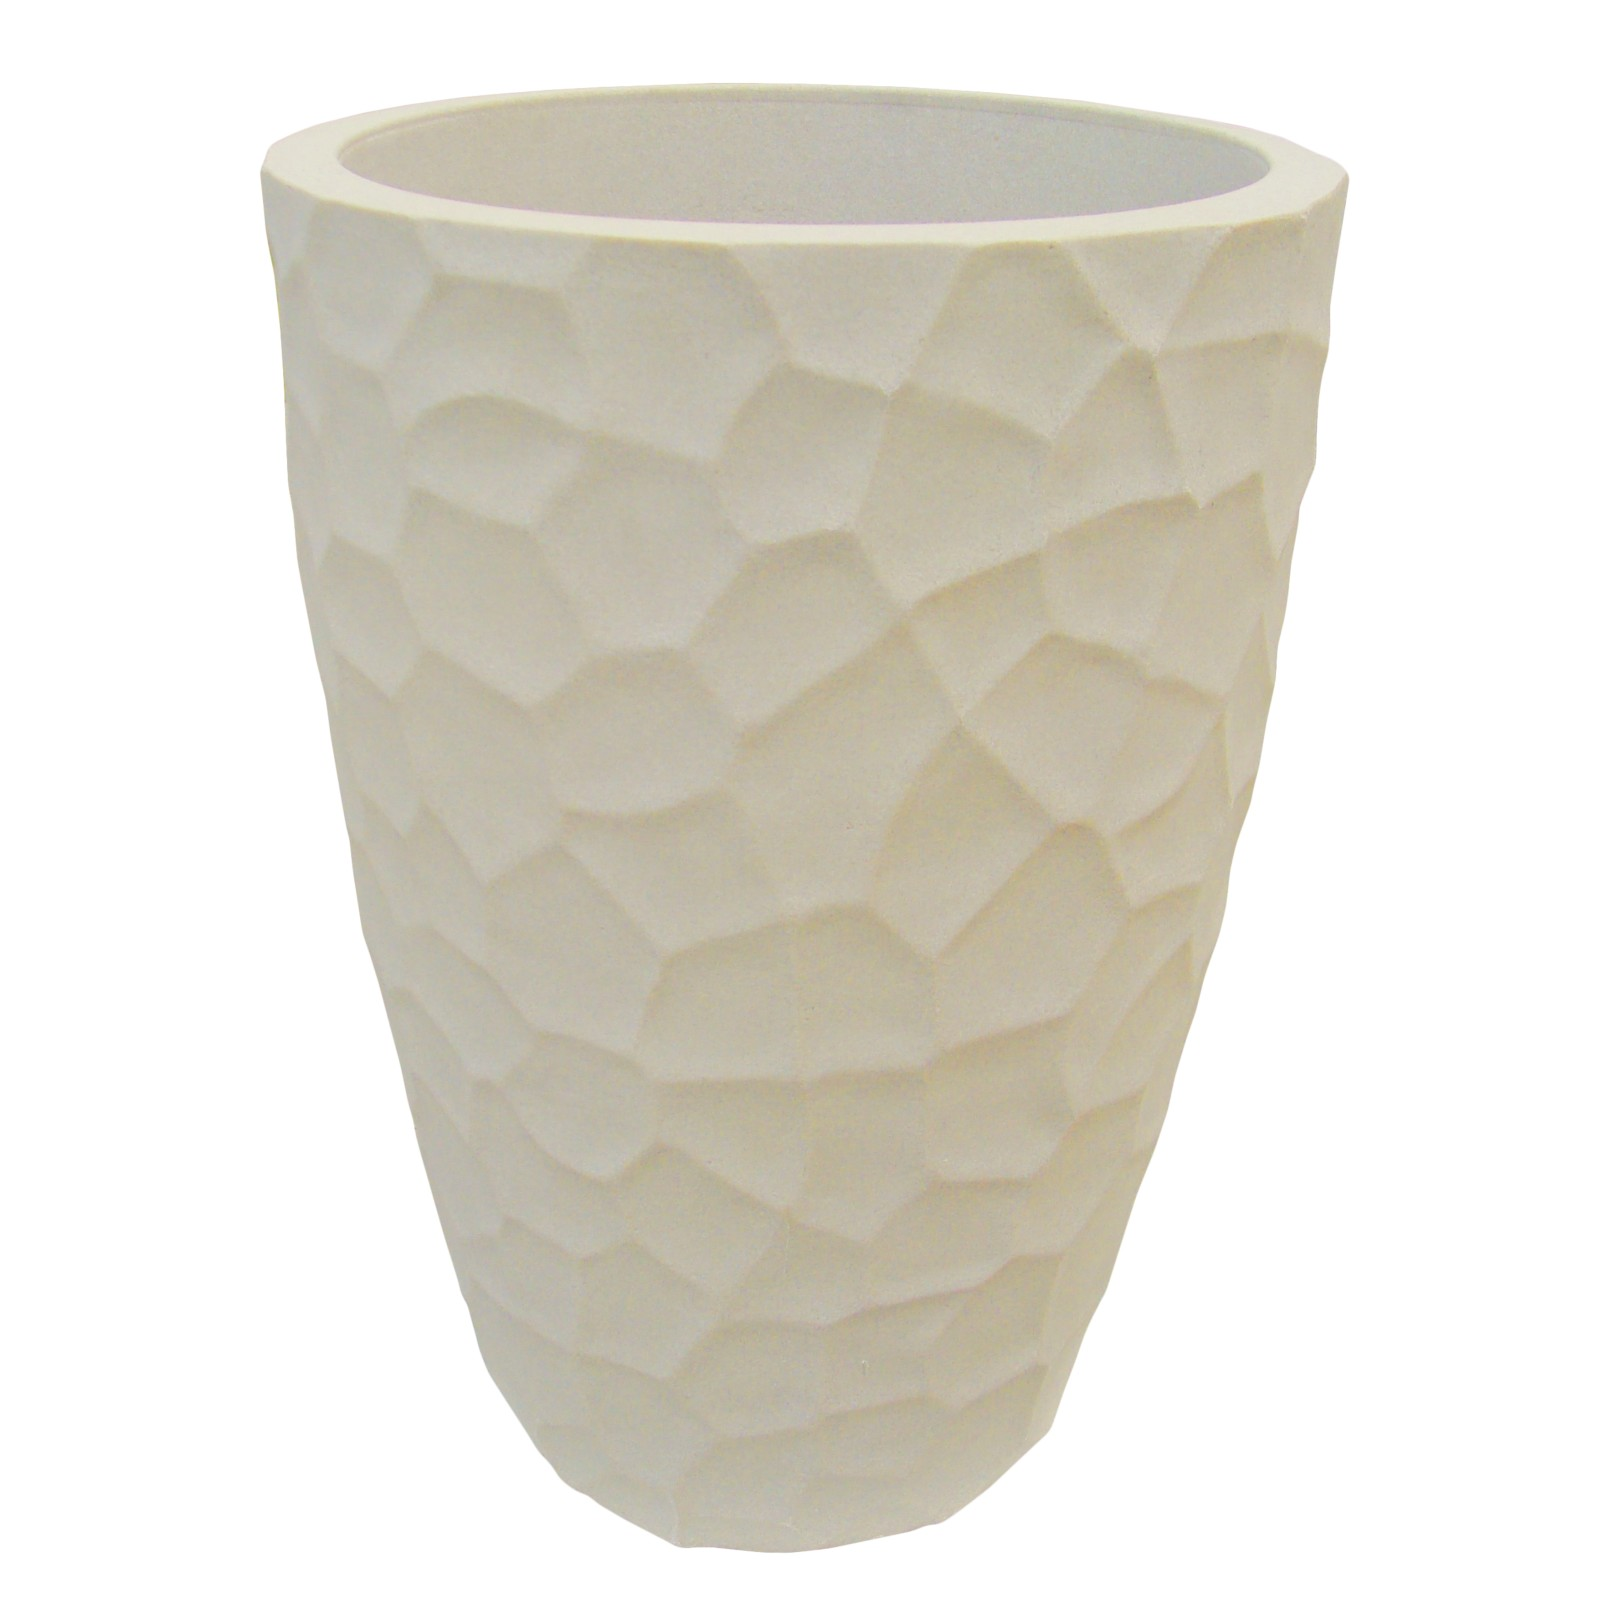 Vaso para Plantas Polietileno 44x31 cm Conico Cimento - Japi